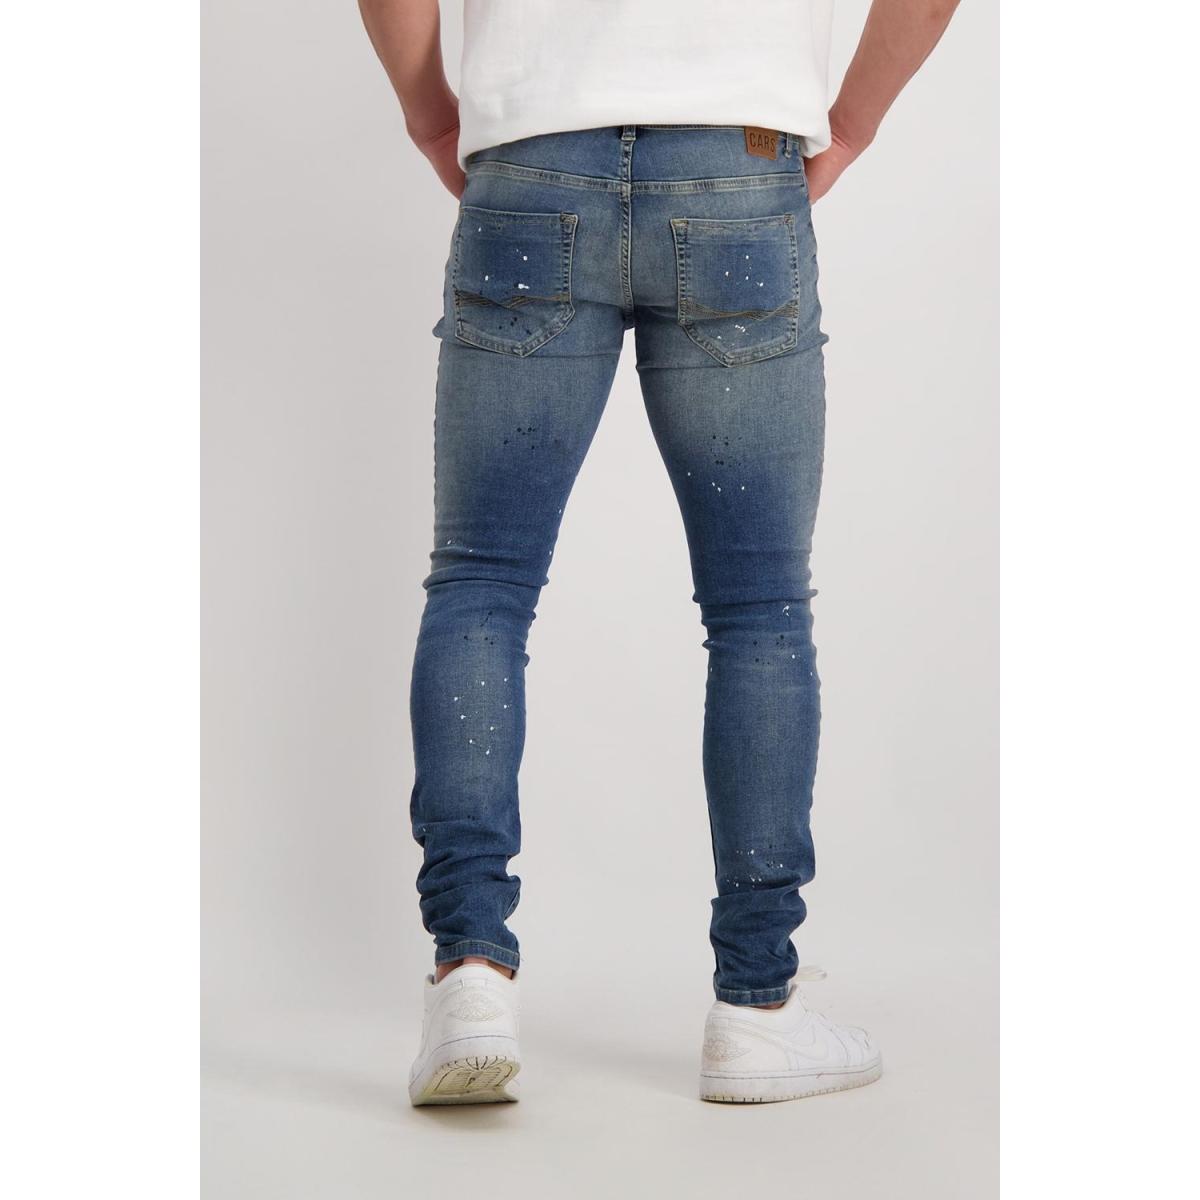 cavin super skinny 79538 cars jeans 03 dark used